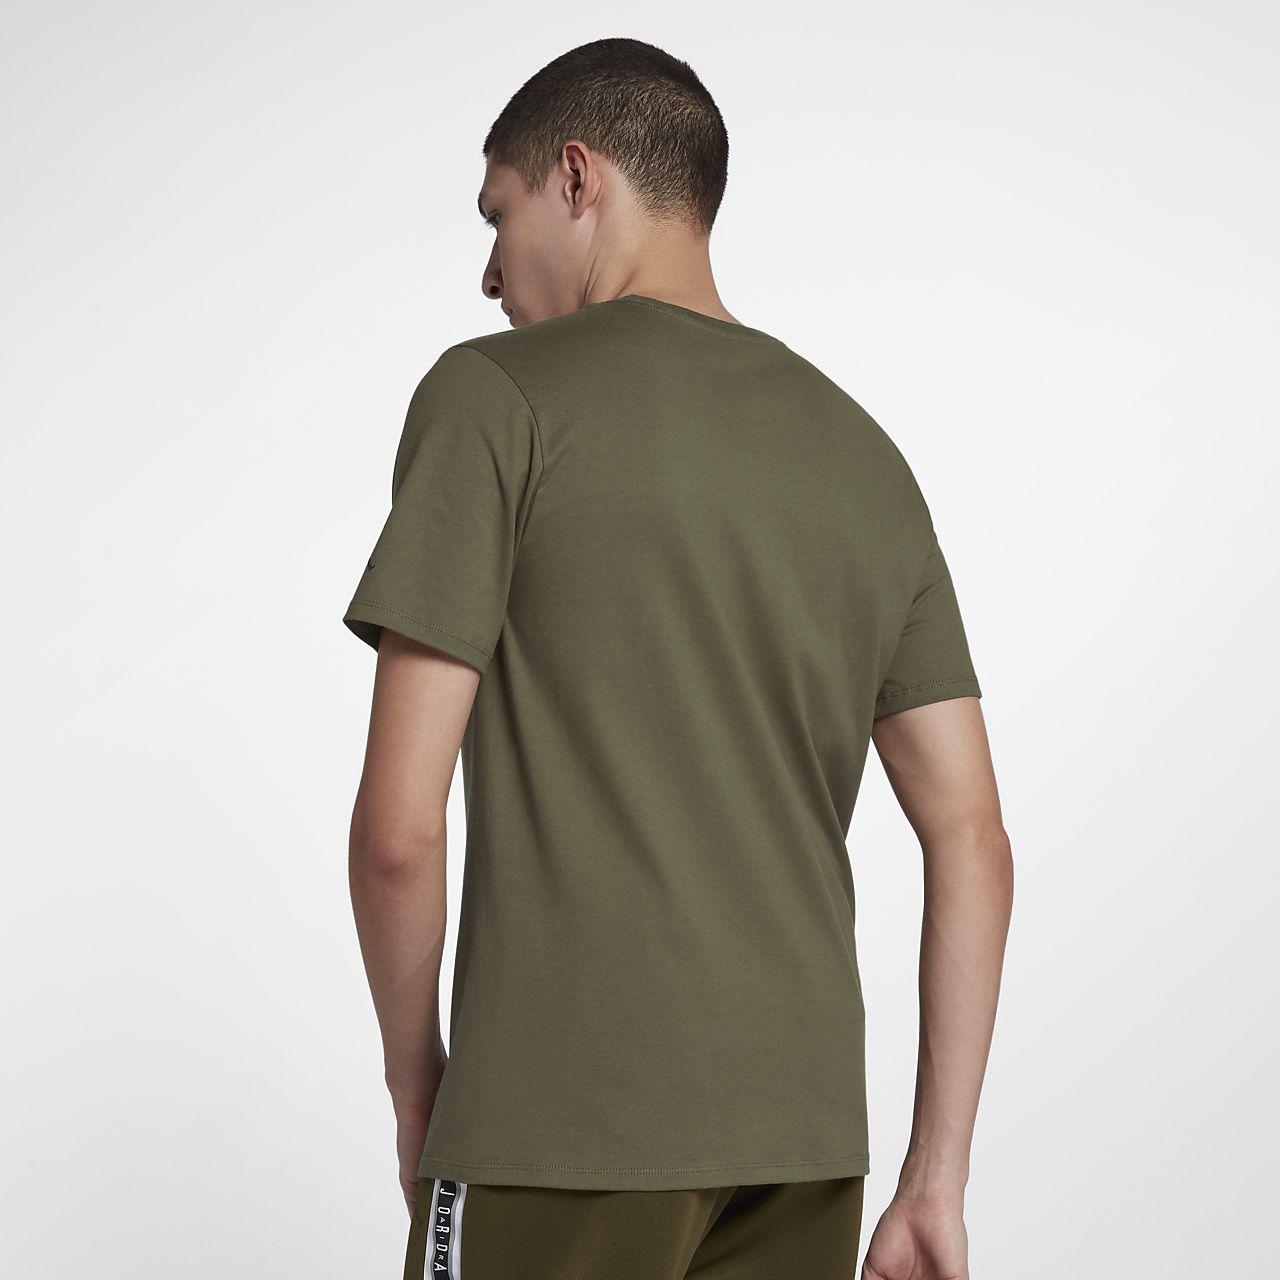 42c2410a46f2 Jordan Sportswear AJ 19 CNXN Men s T-Shirt. Nike.com